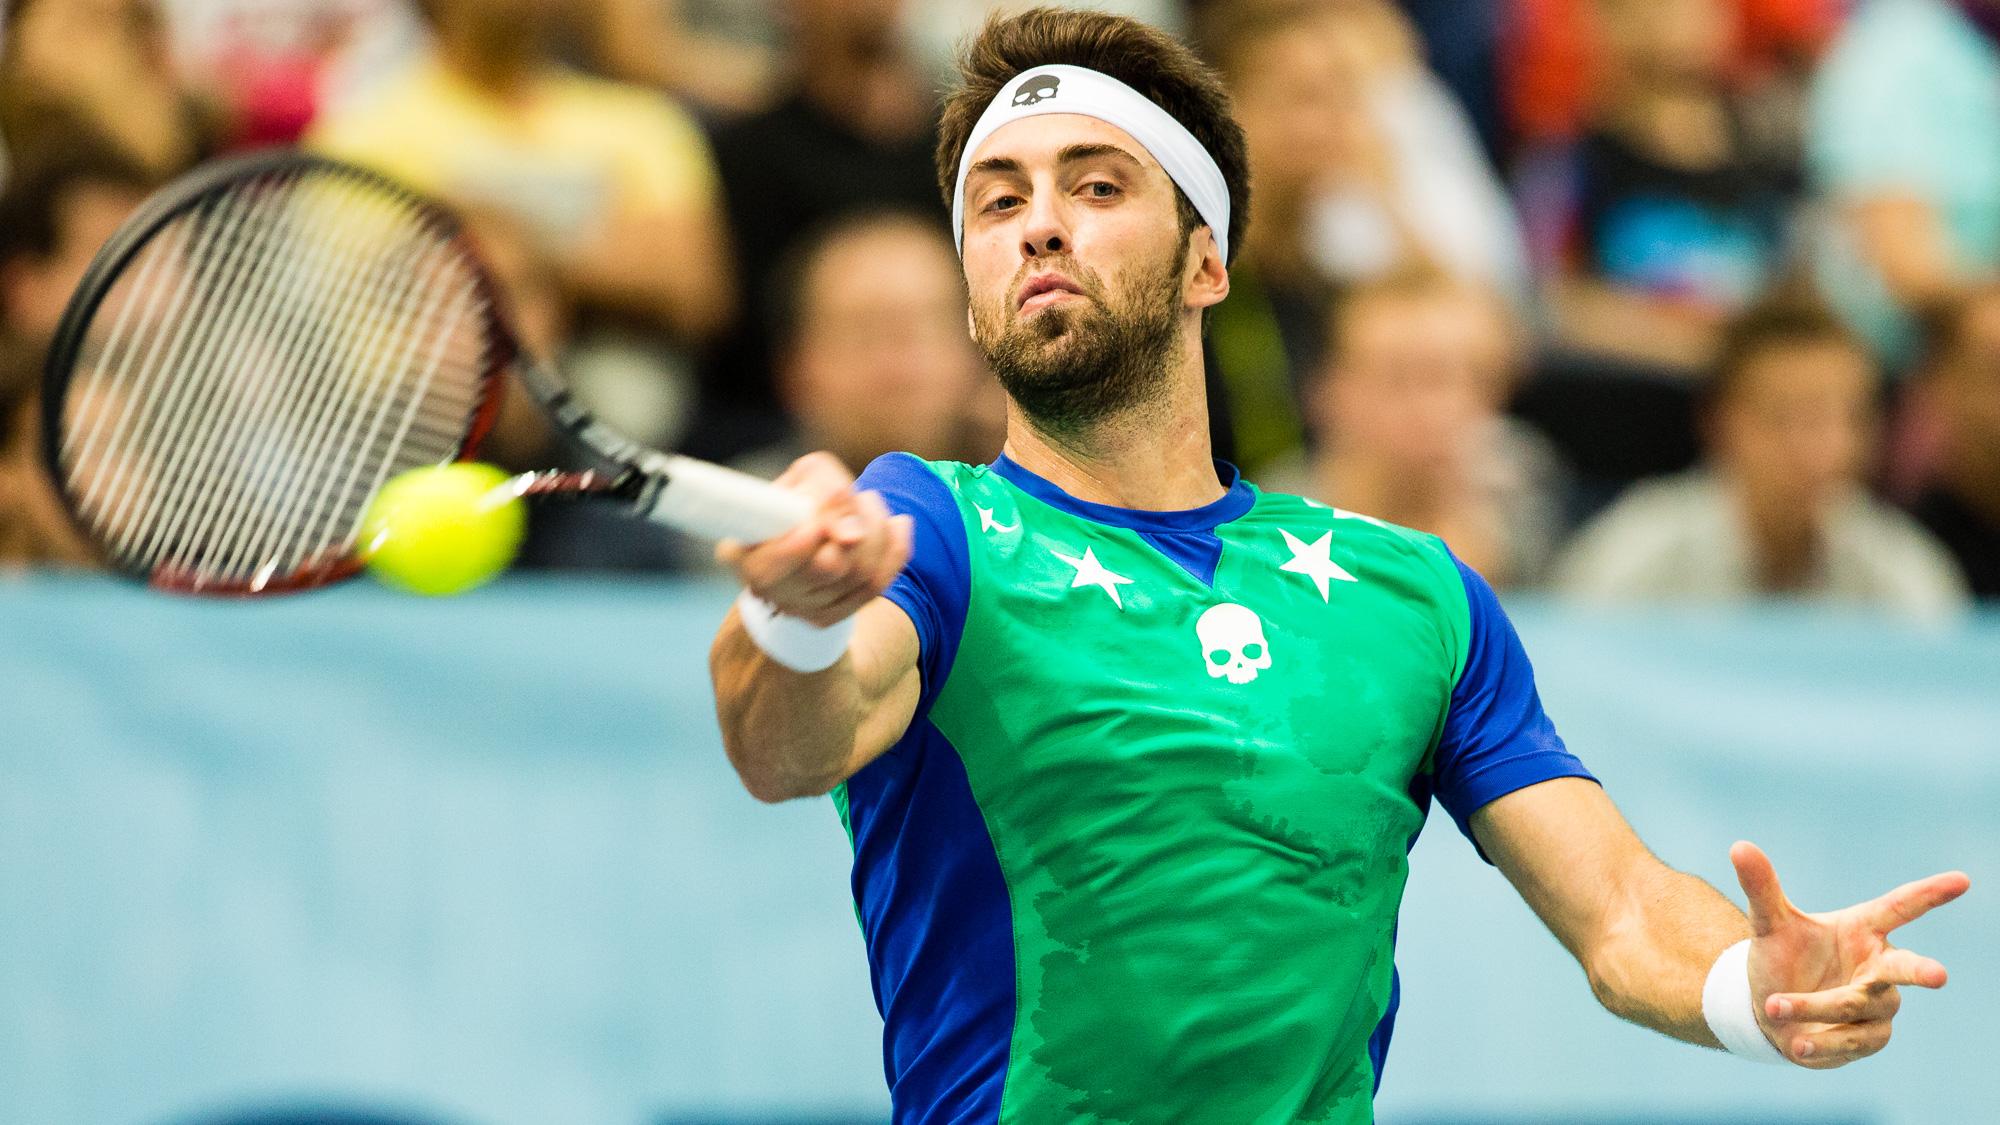 File:ATP World Tour 500 Vienna 2016 N. Basilashvili (GEO) vs R. Albot  (MDA)-8.jpg - Wikimedia Commons